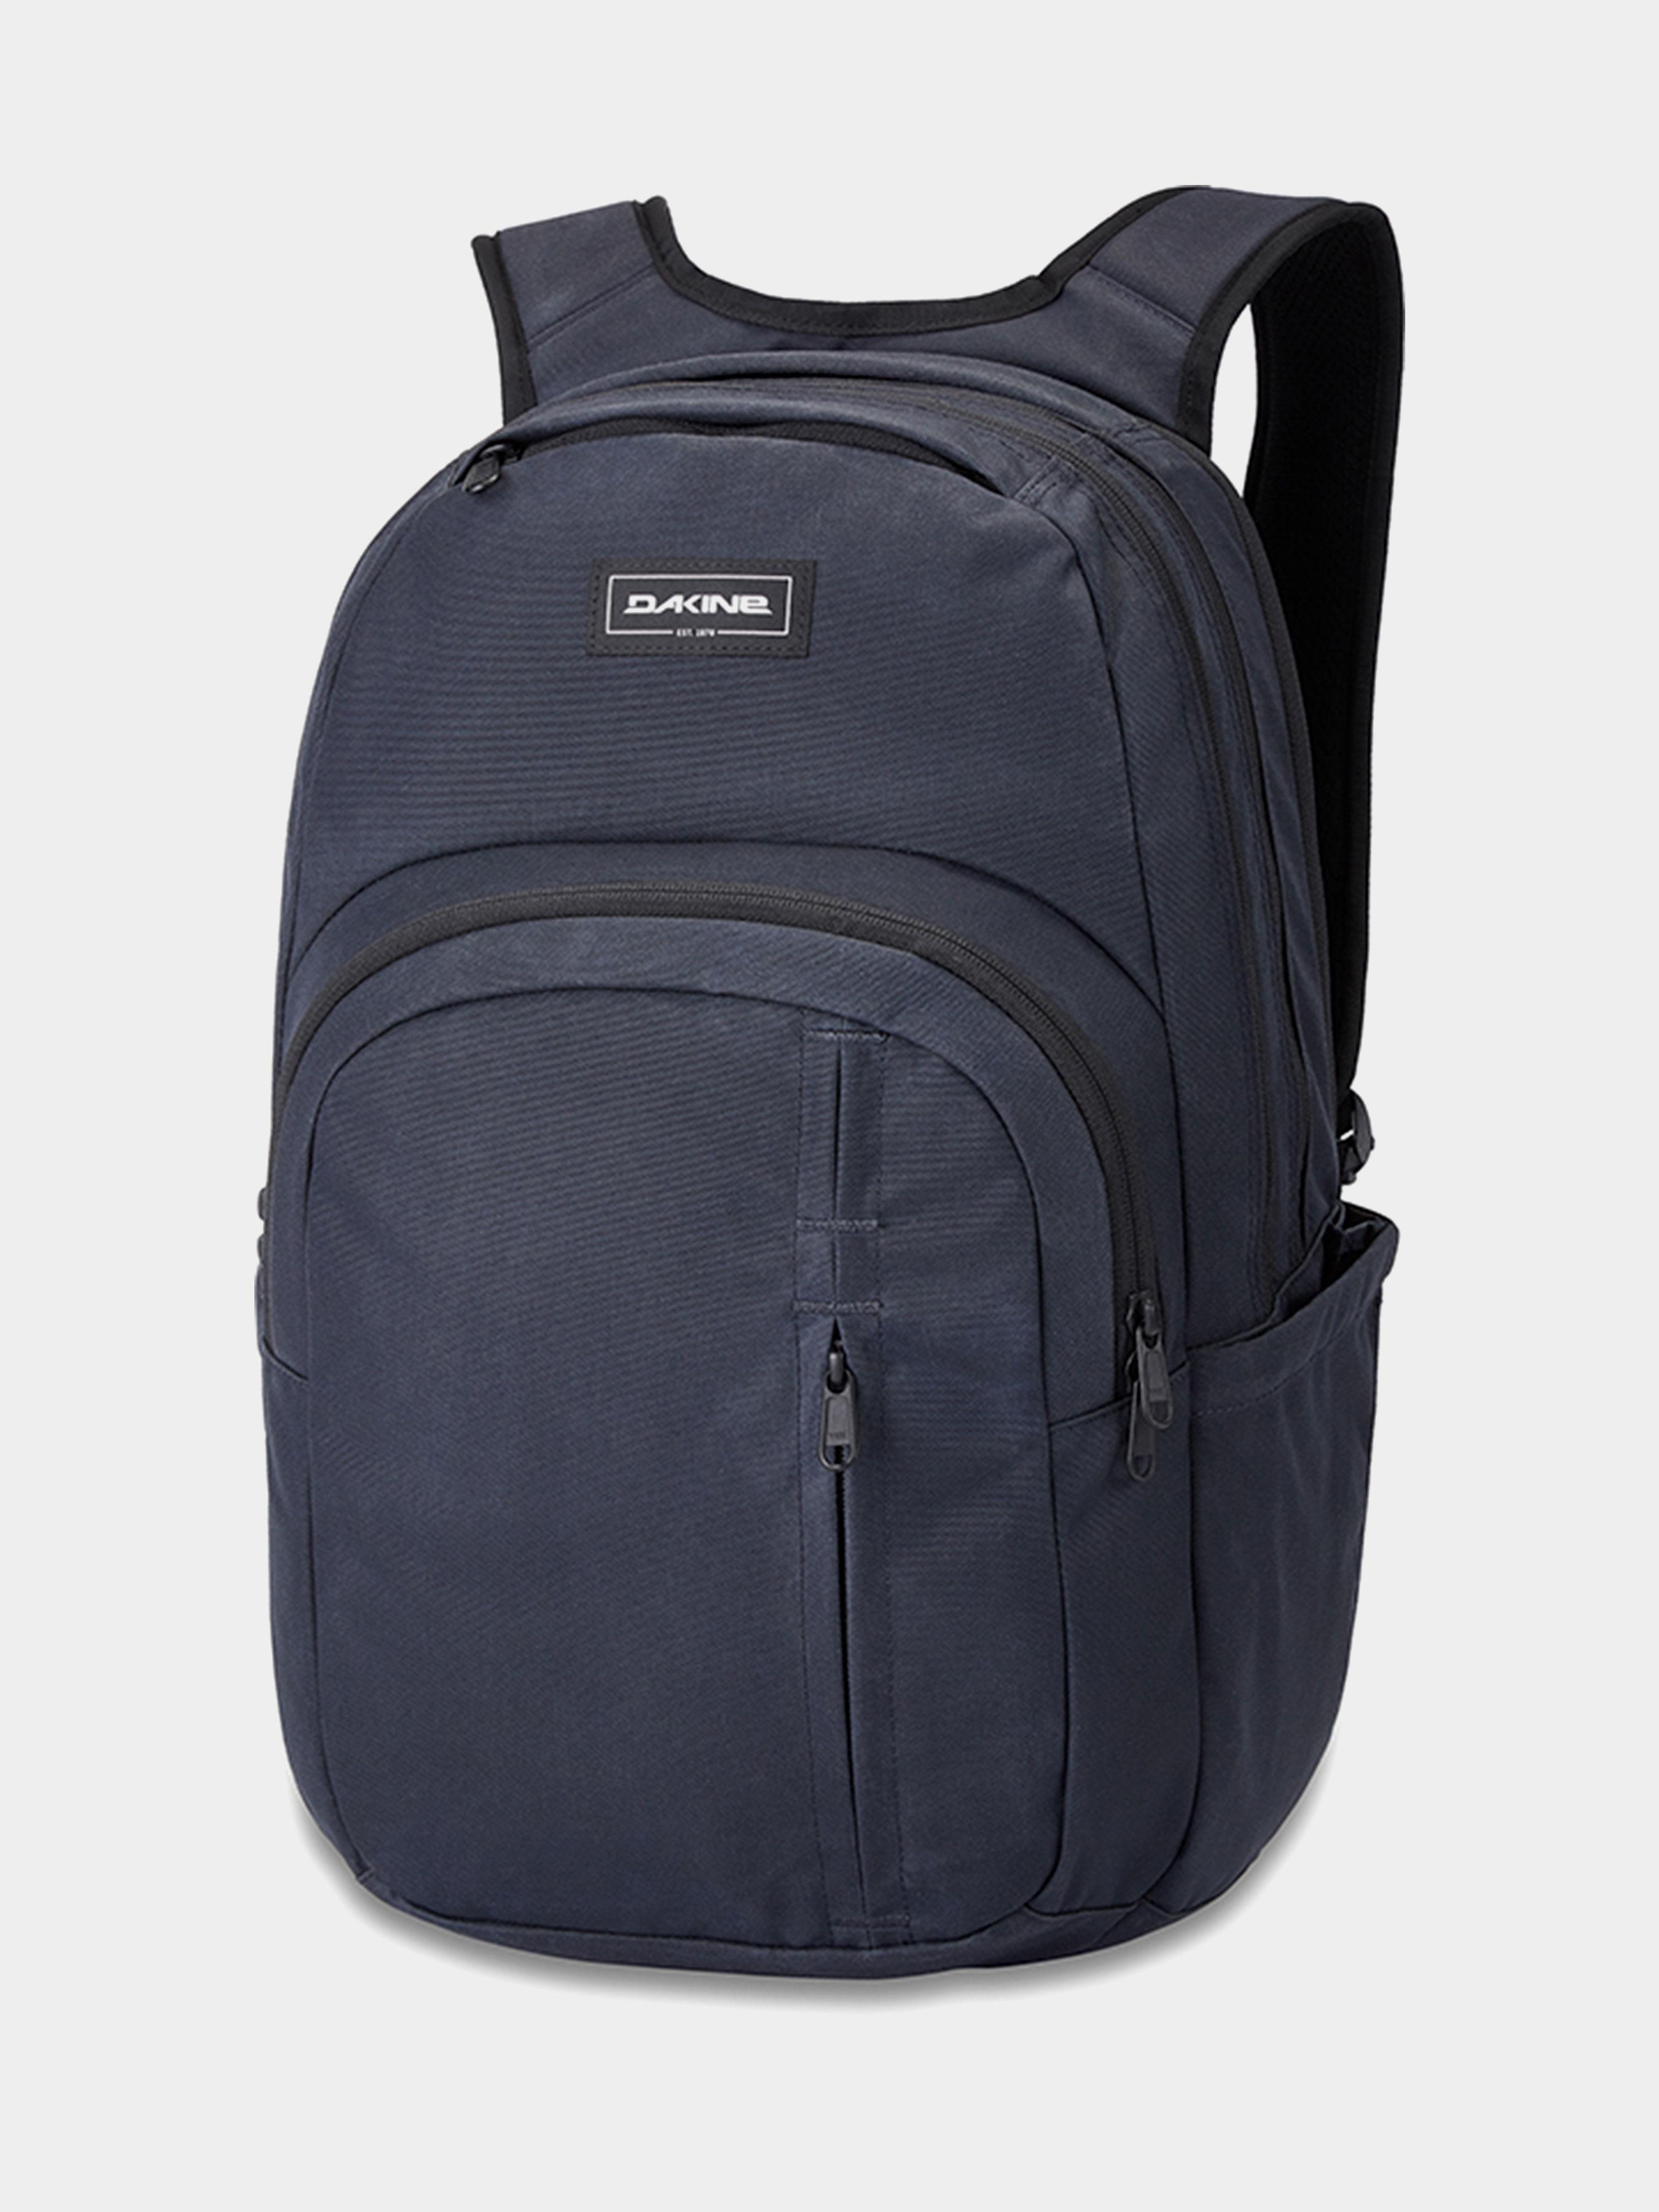 Купить Рюкзак модель 10002632_ngs, Dakine, Синий